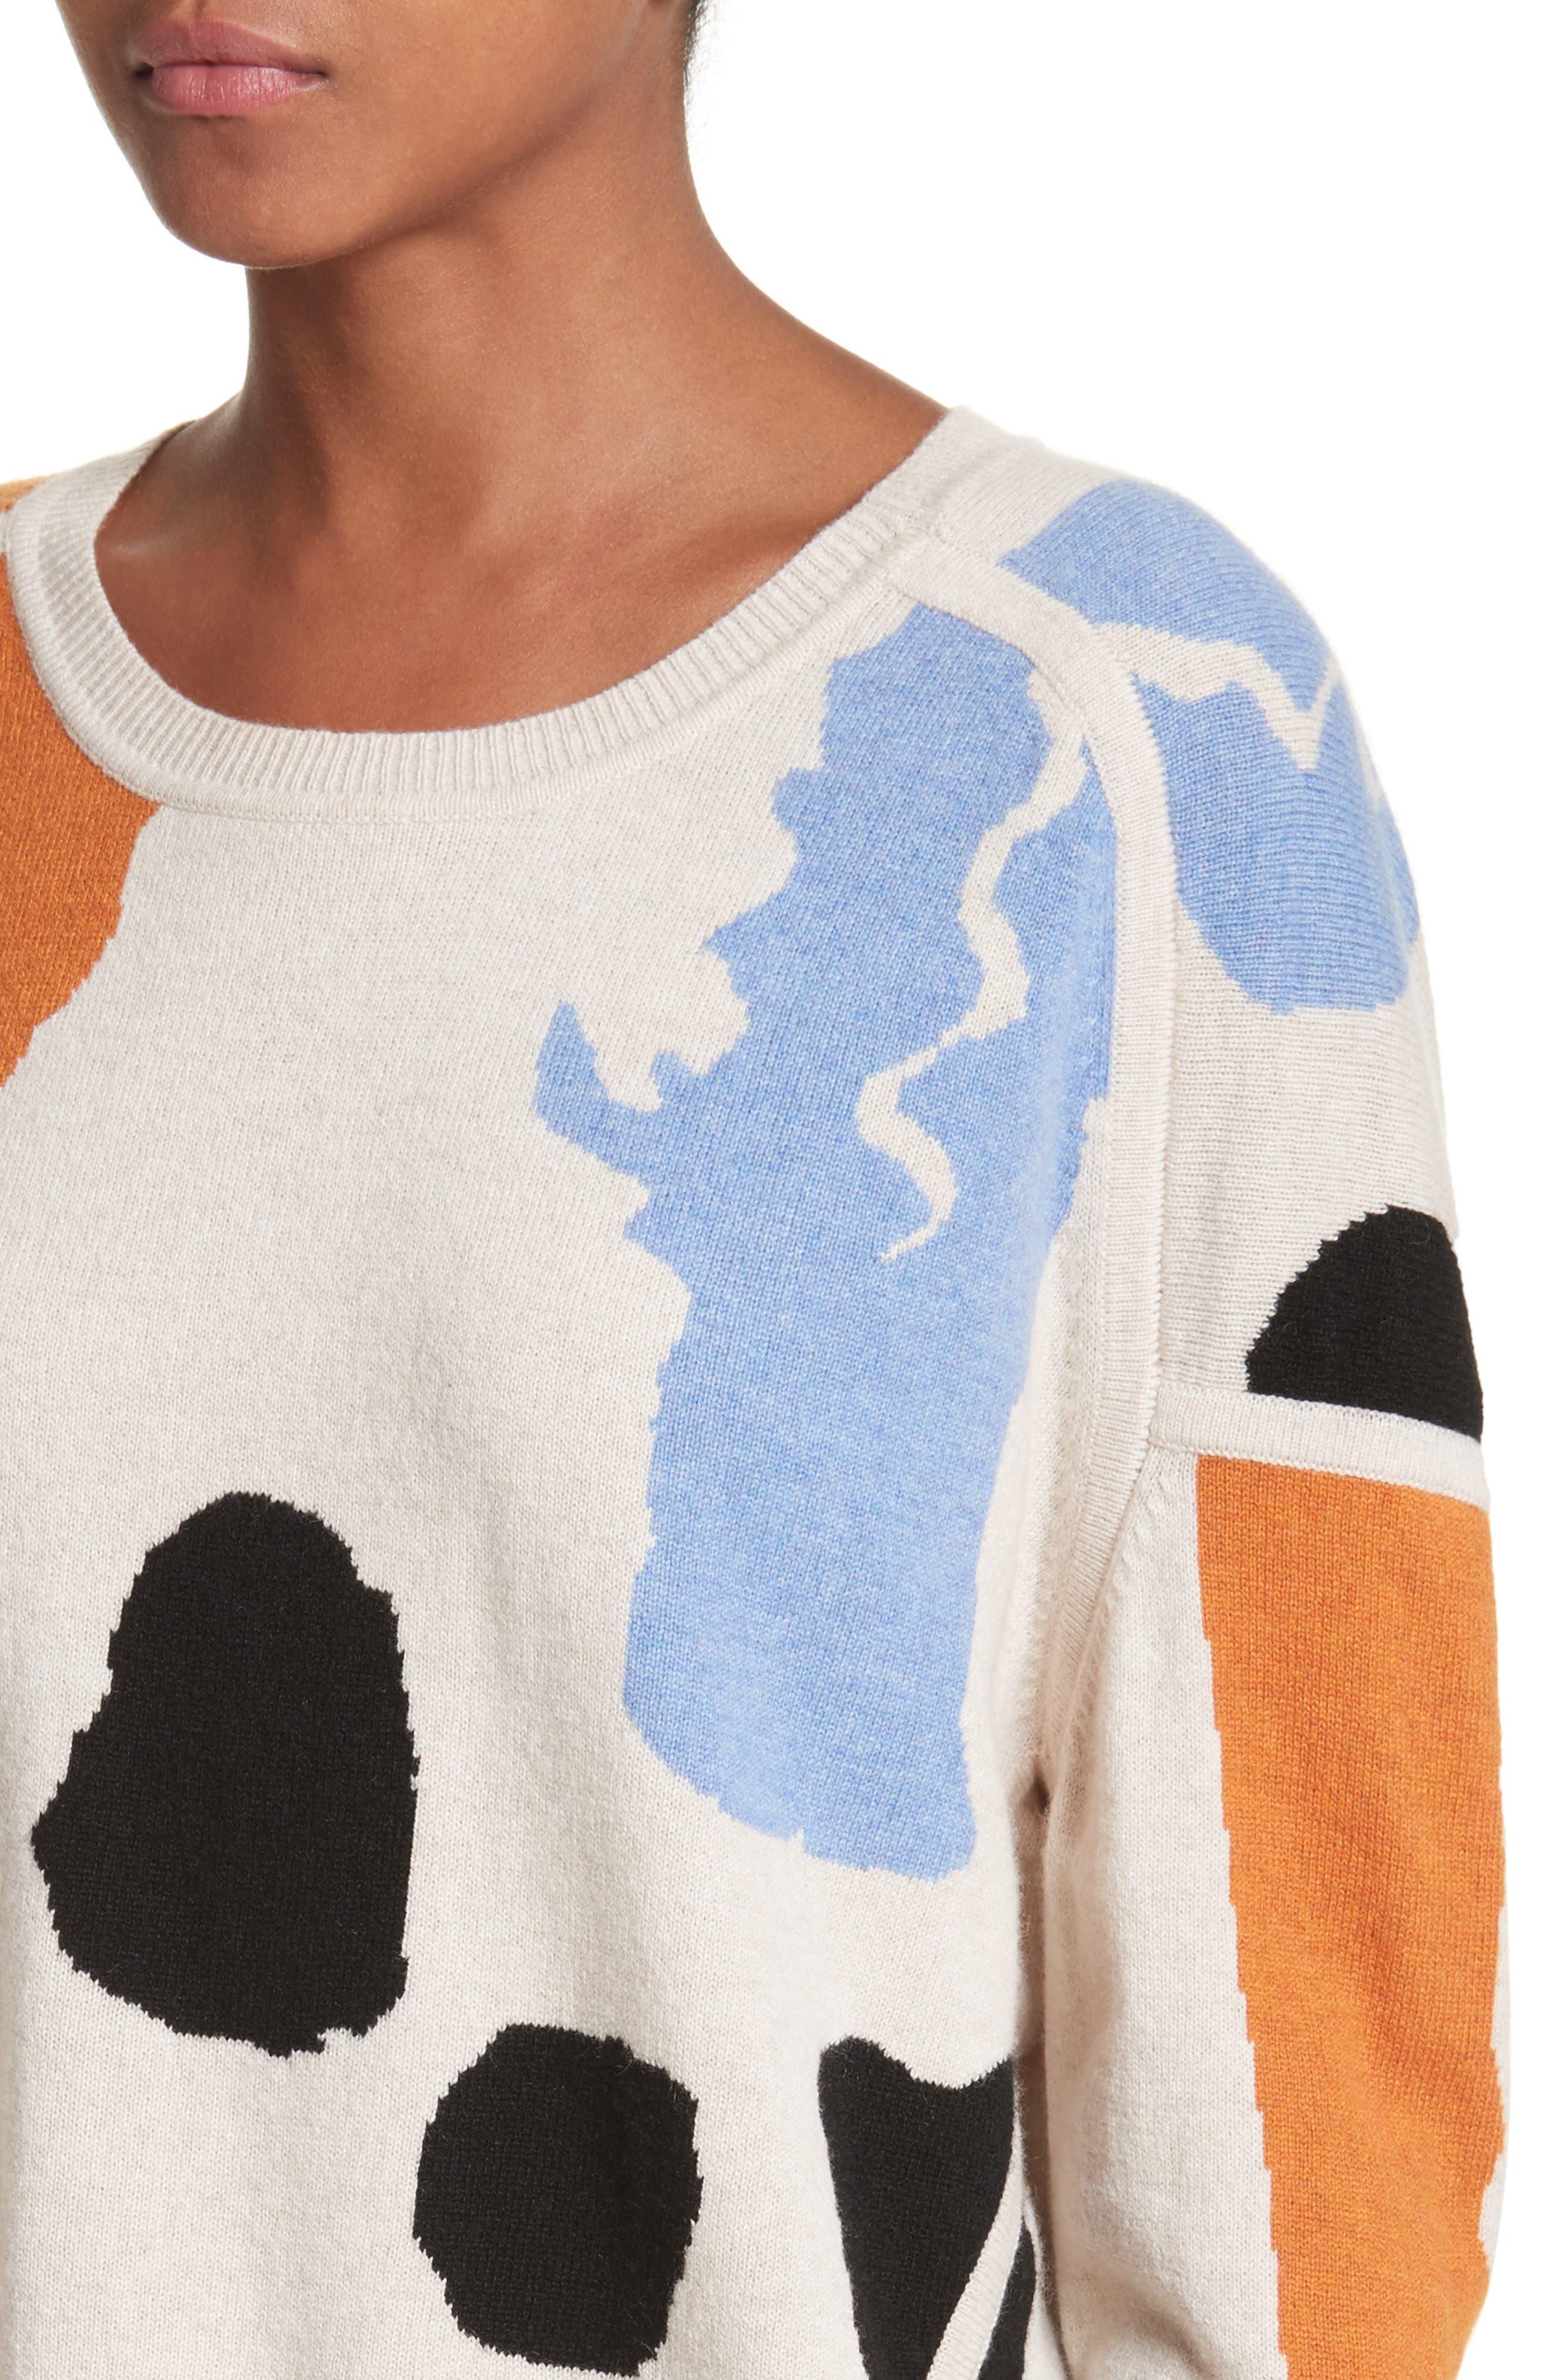 ZERO + MARIA CORNEJO,                             Palette Cashmere & Merino Wool Sweater,                             Alternate thumbnail 4, color,                             902